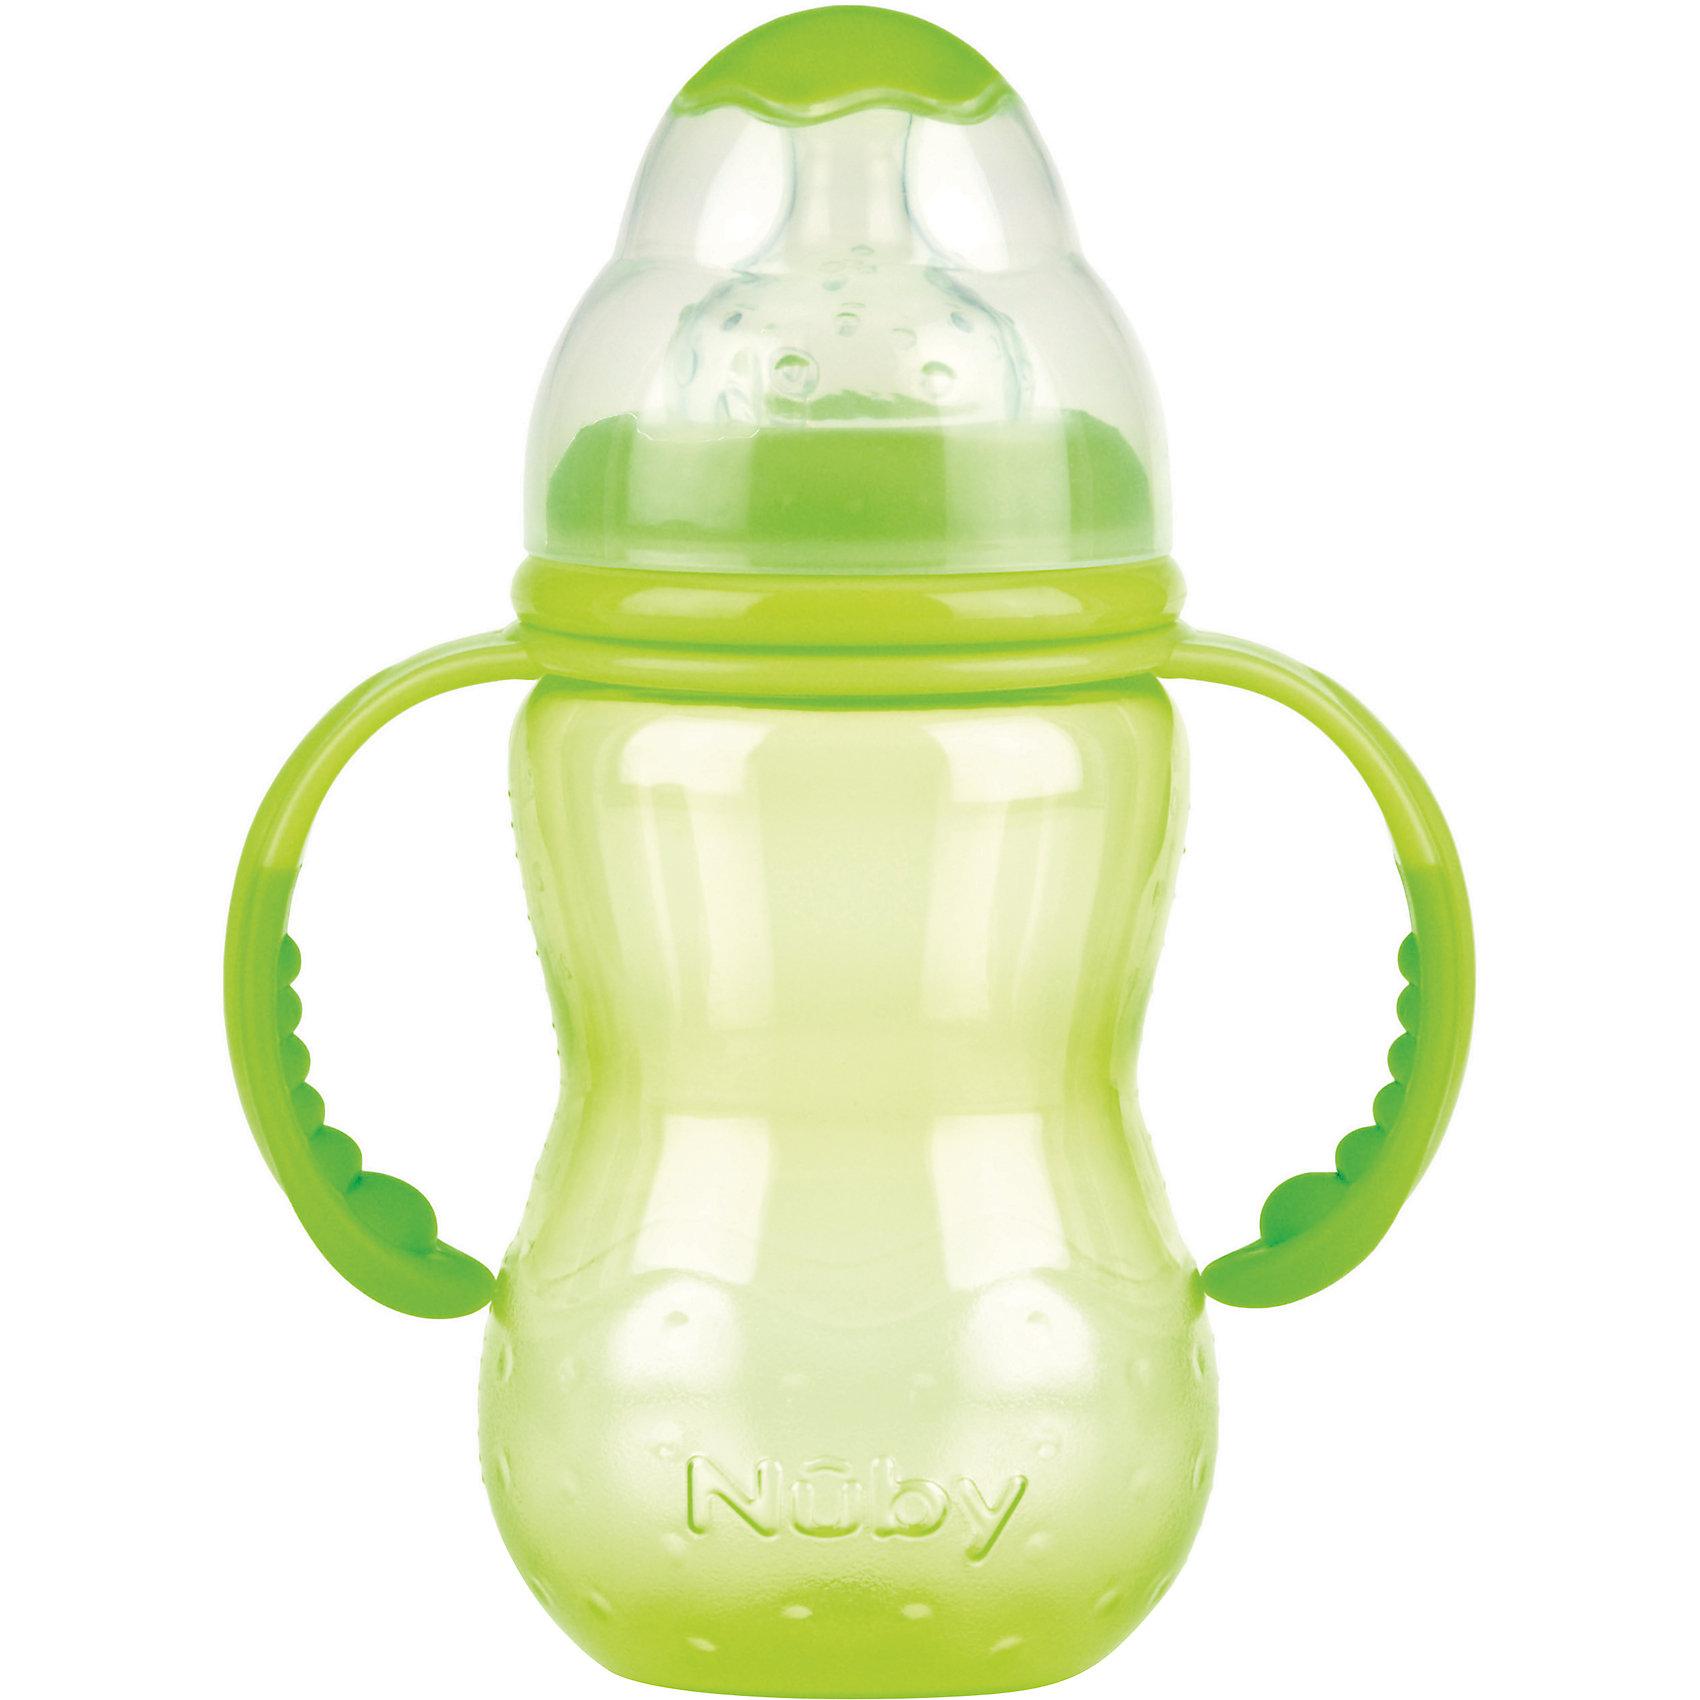 Бутылочка с широким горлом, Nuby, 300 мл., зеленый